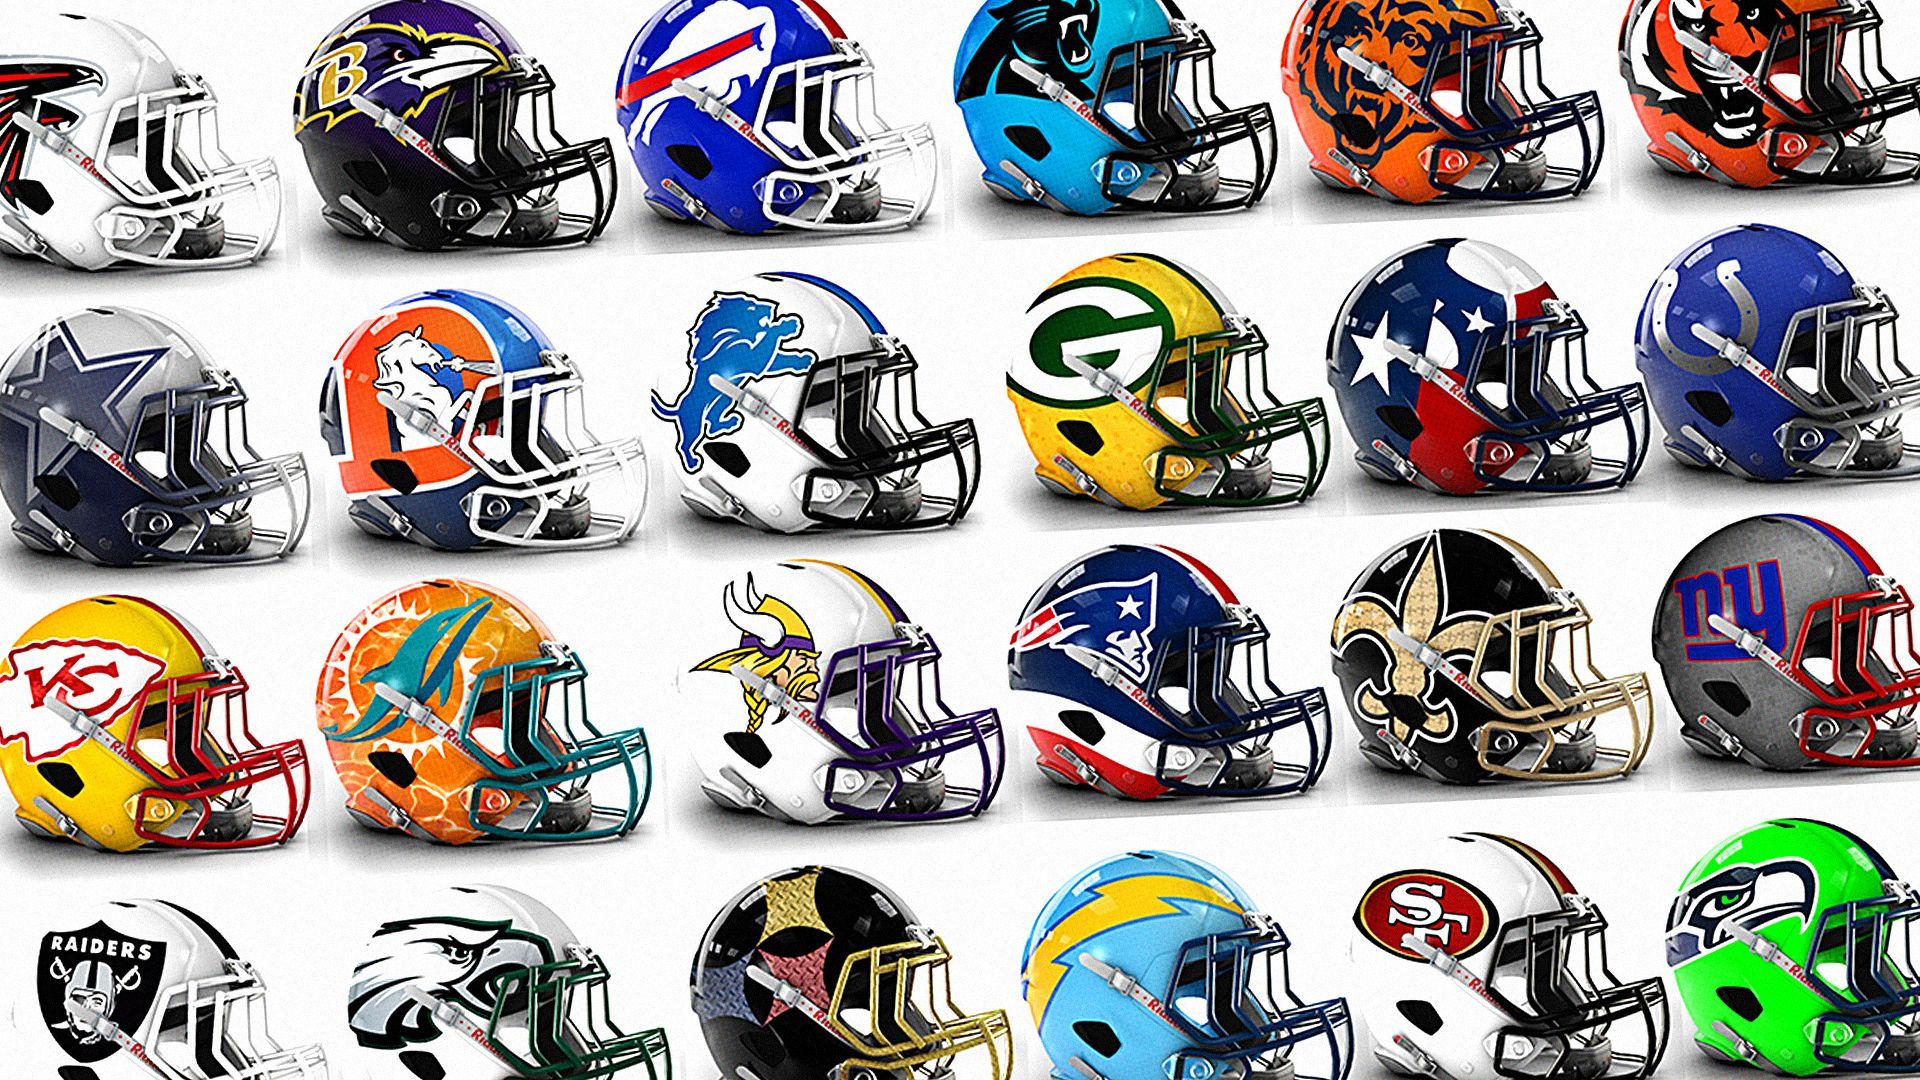 586eecb09 See Bold Alternate Helmet Designs For All 32 NFL Teams